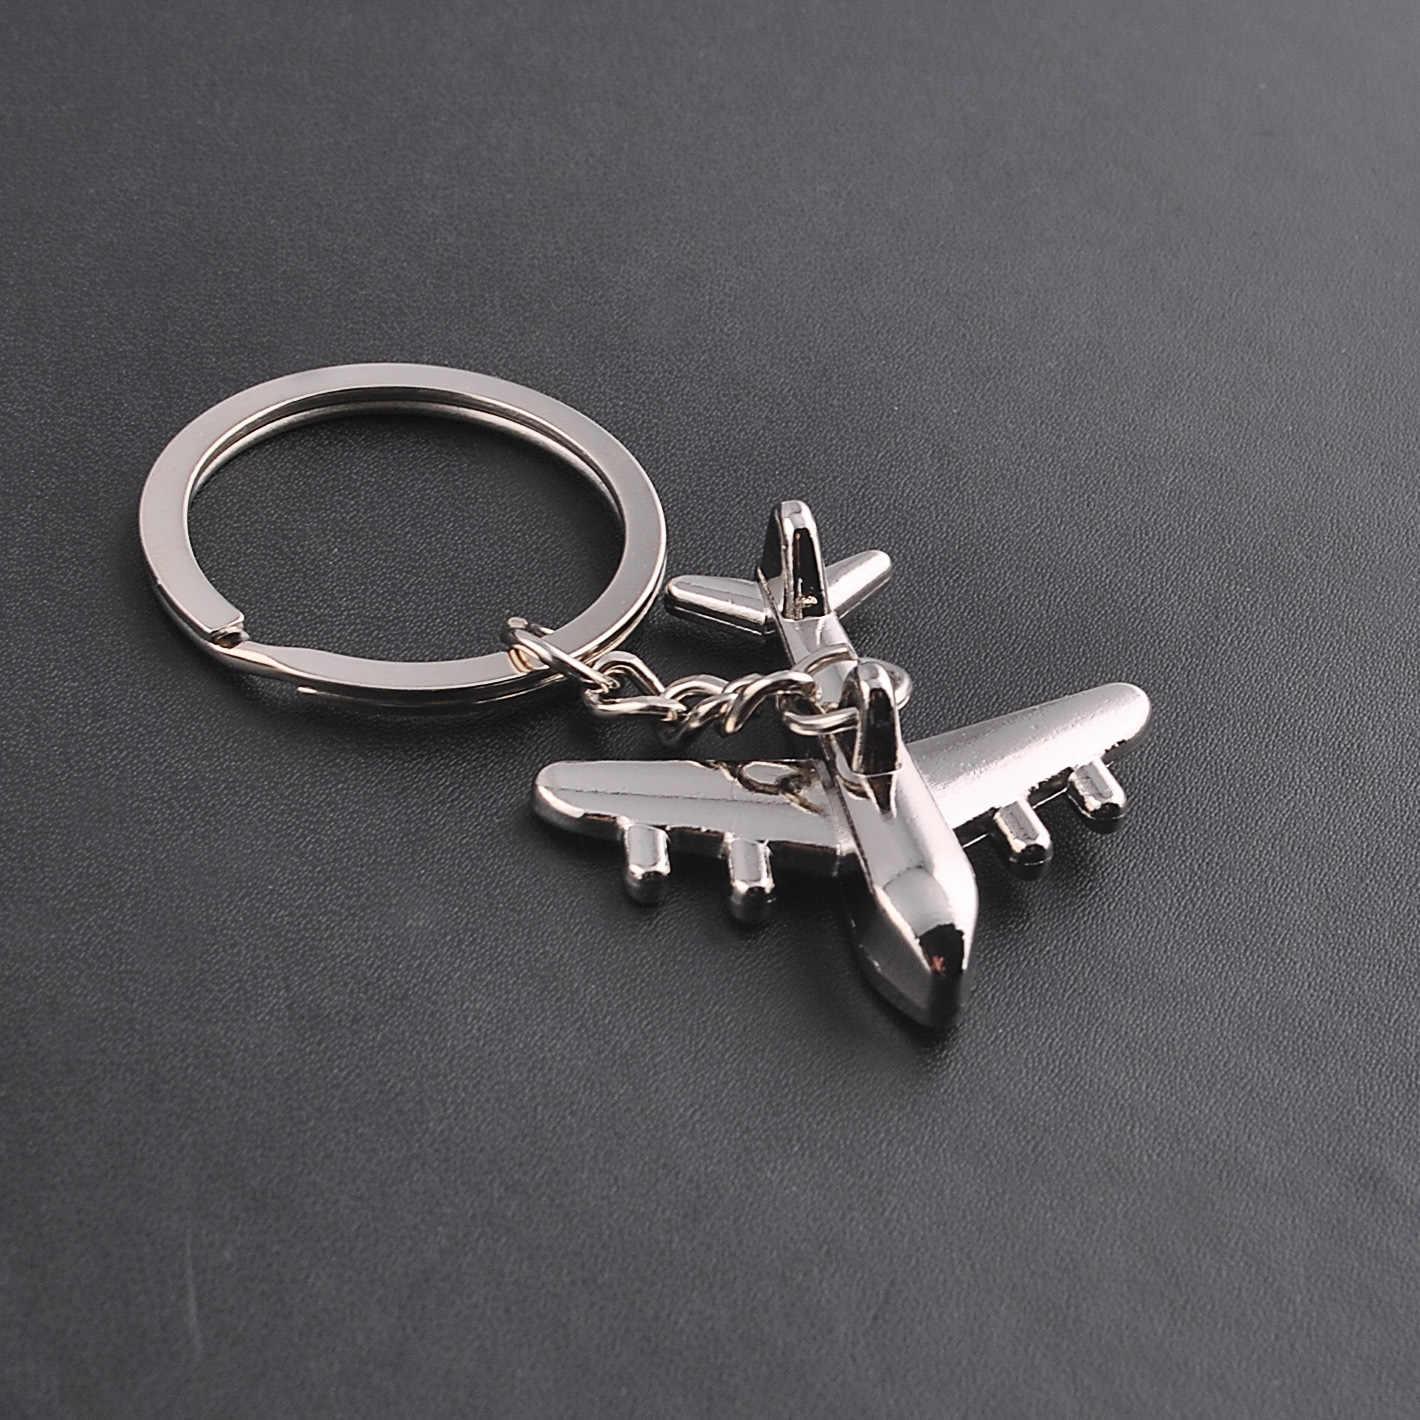 ... Keychain Modern Fighter Aircraft Airplane Key Chain Mini aircraft Key  Ring Bag Pendant Car Keyring For ... 149df04eb